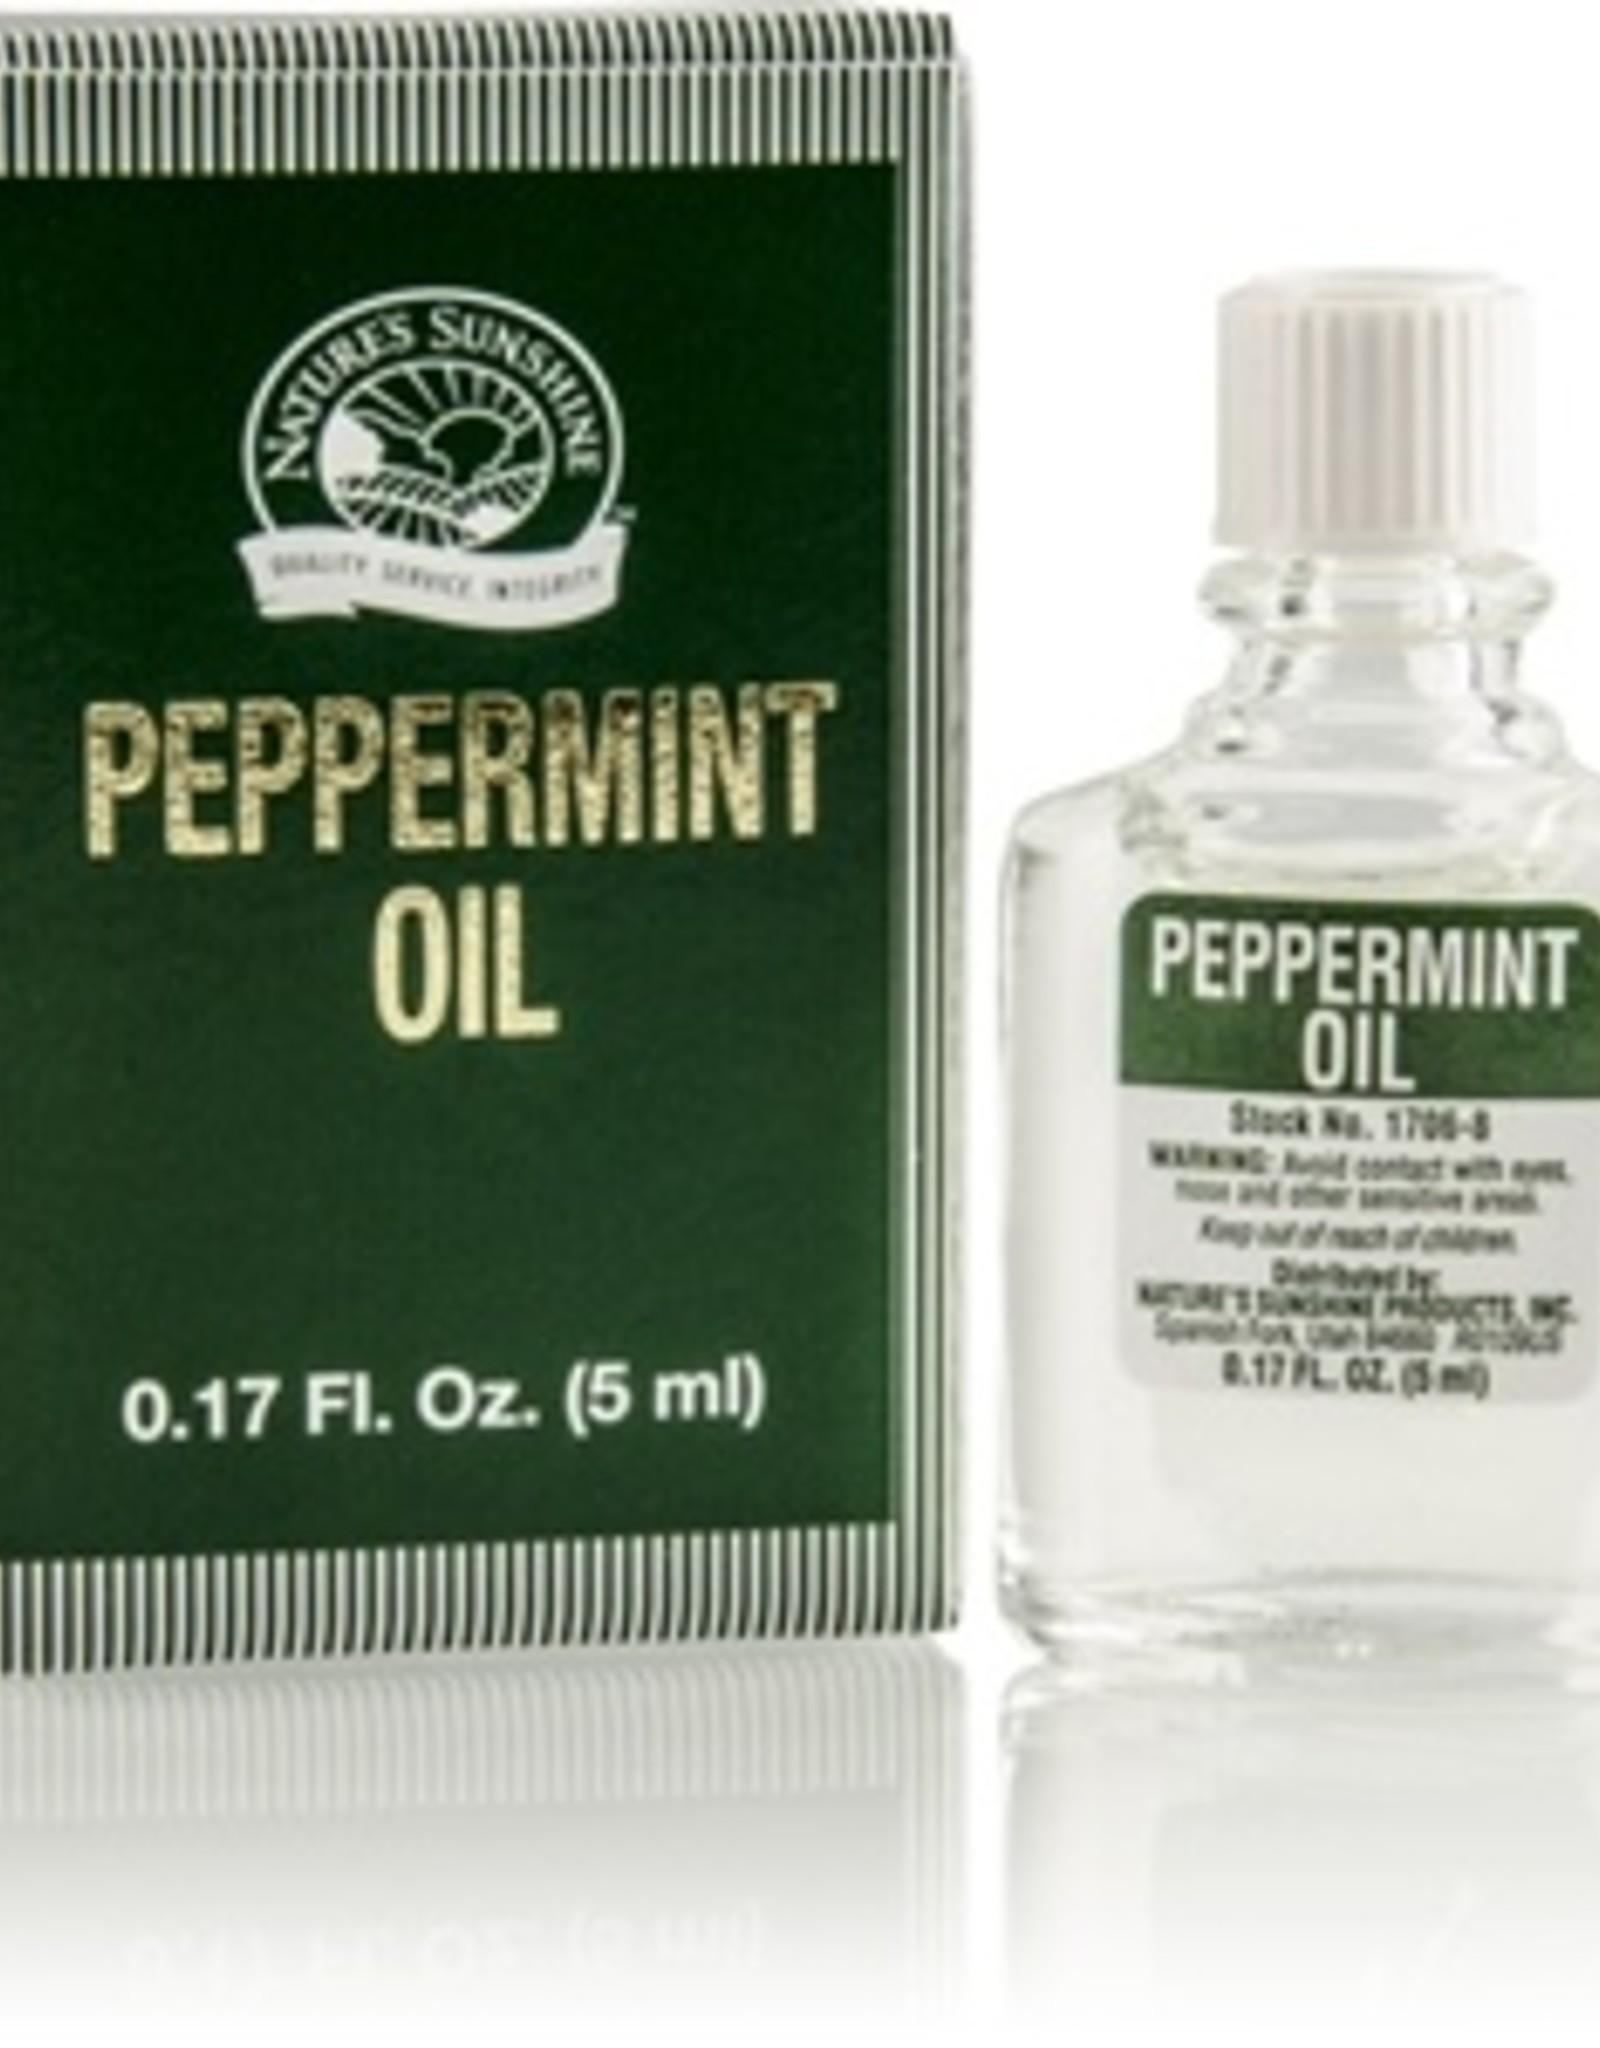 Nature's Sunshine Peppermint Oil 0.17 fl. oz. NSP